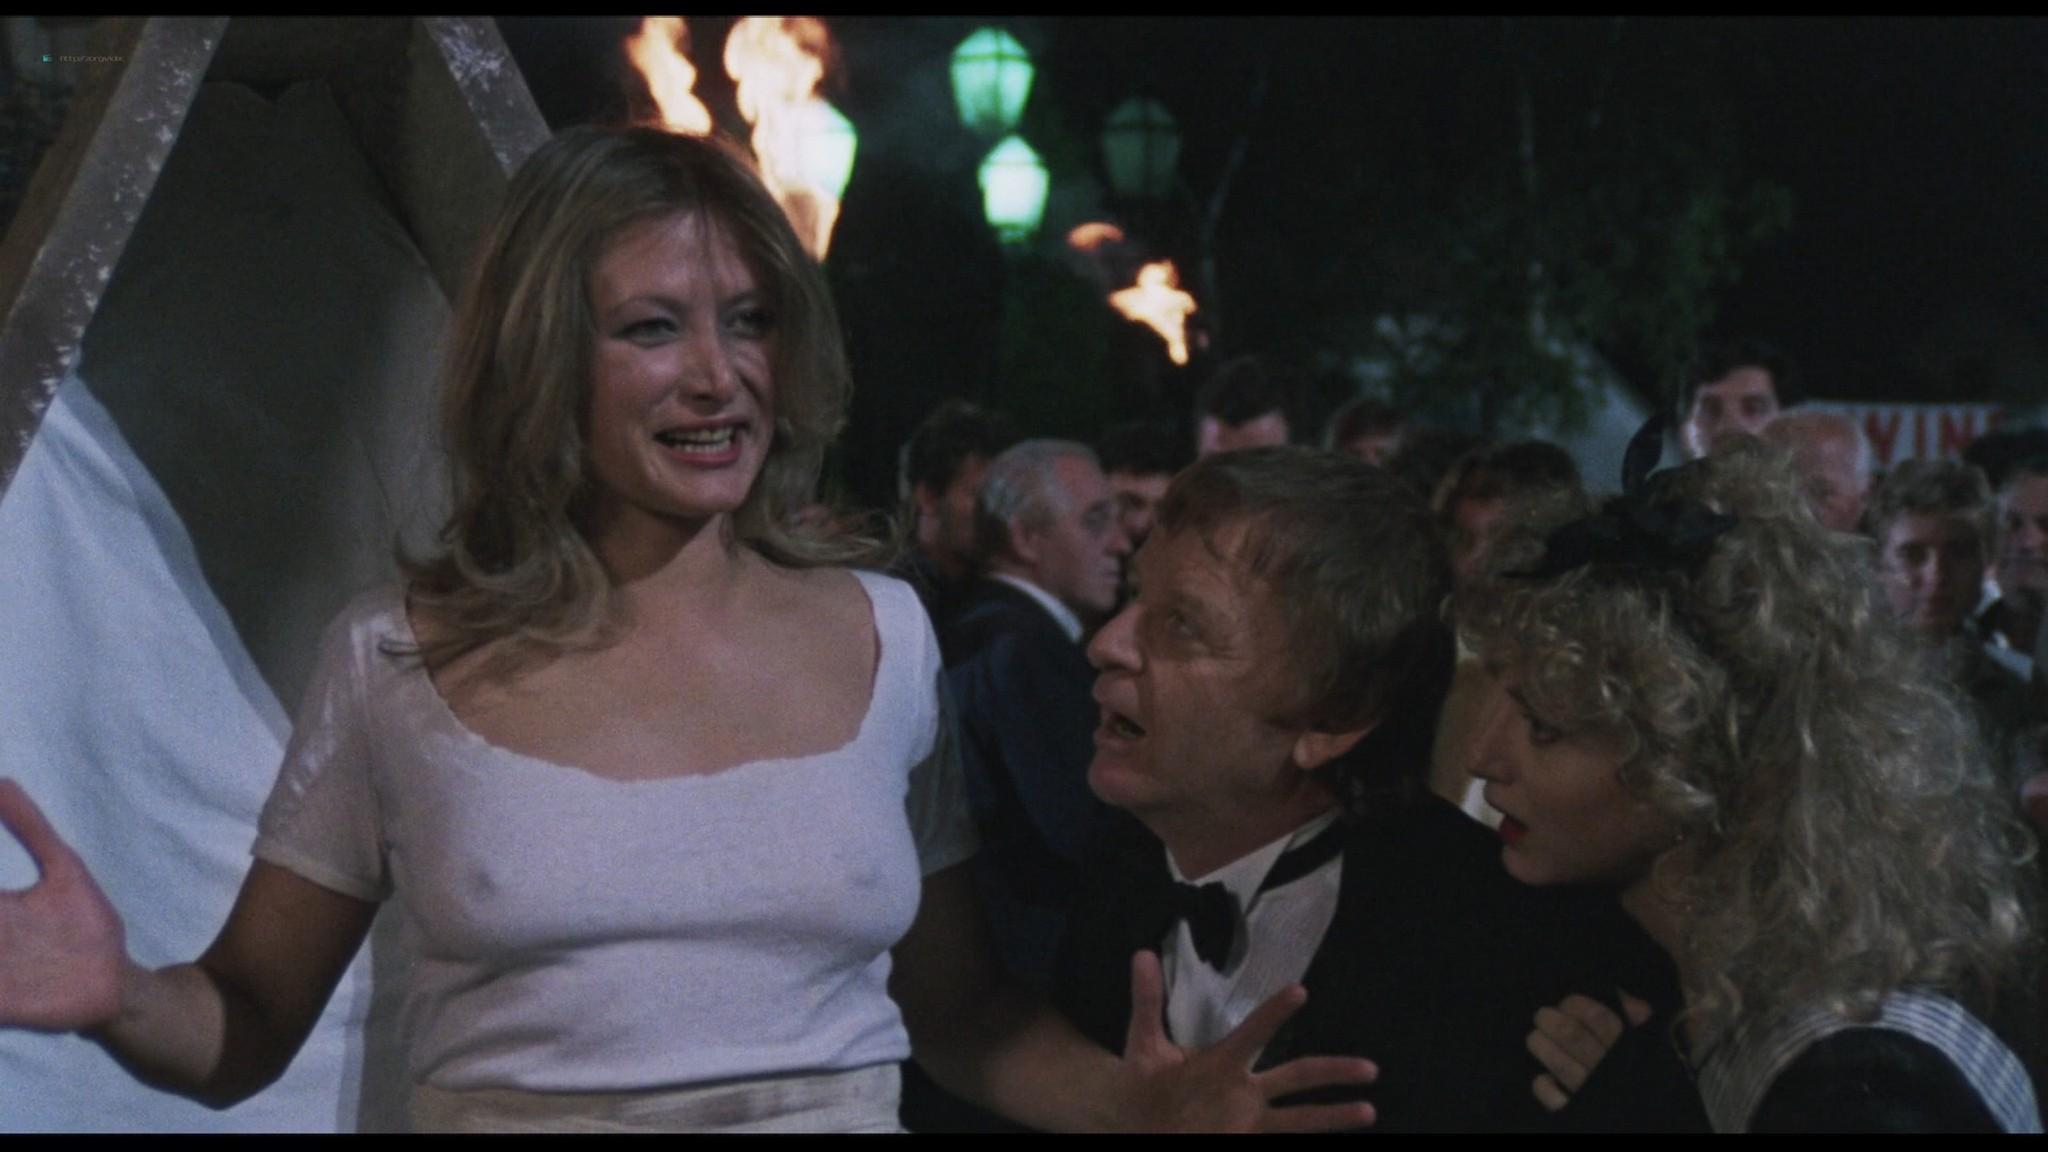 Geena Davis hot and sexy Ksenia Prohaska sexy - Transylvania 6-5000 (1985) HD 1080p BluRay (3)